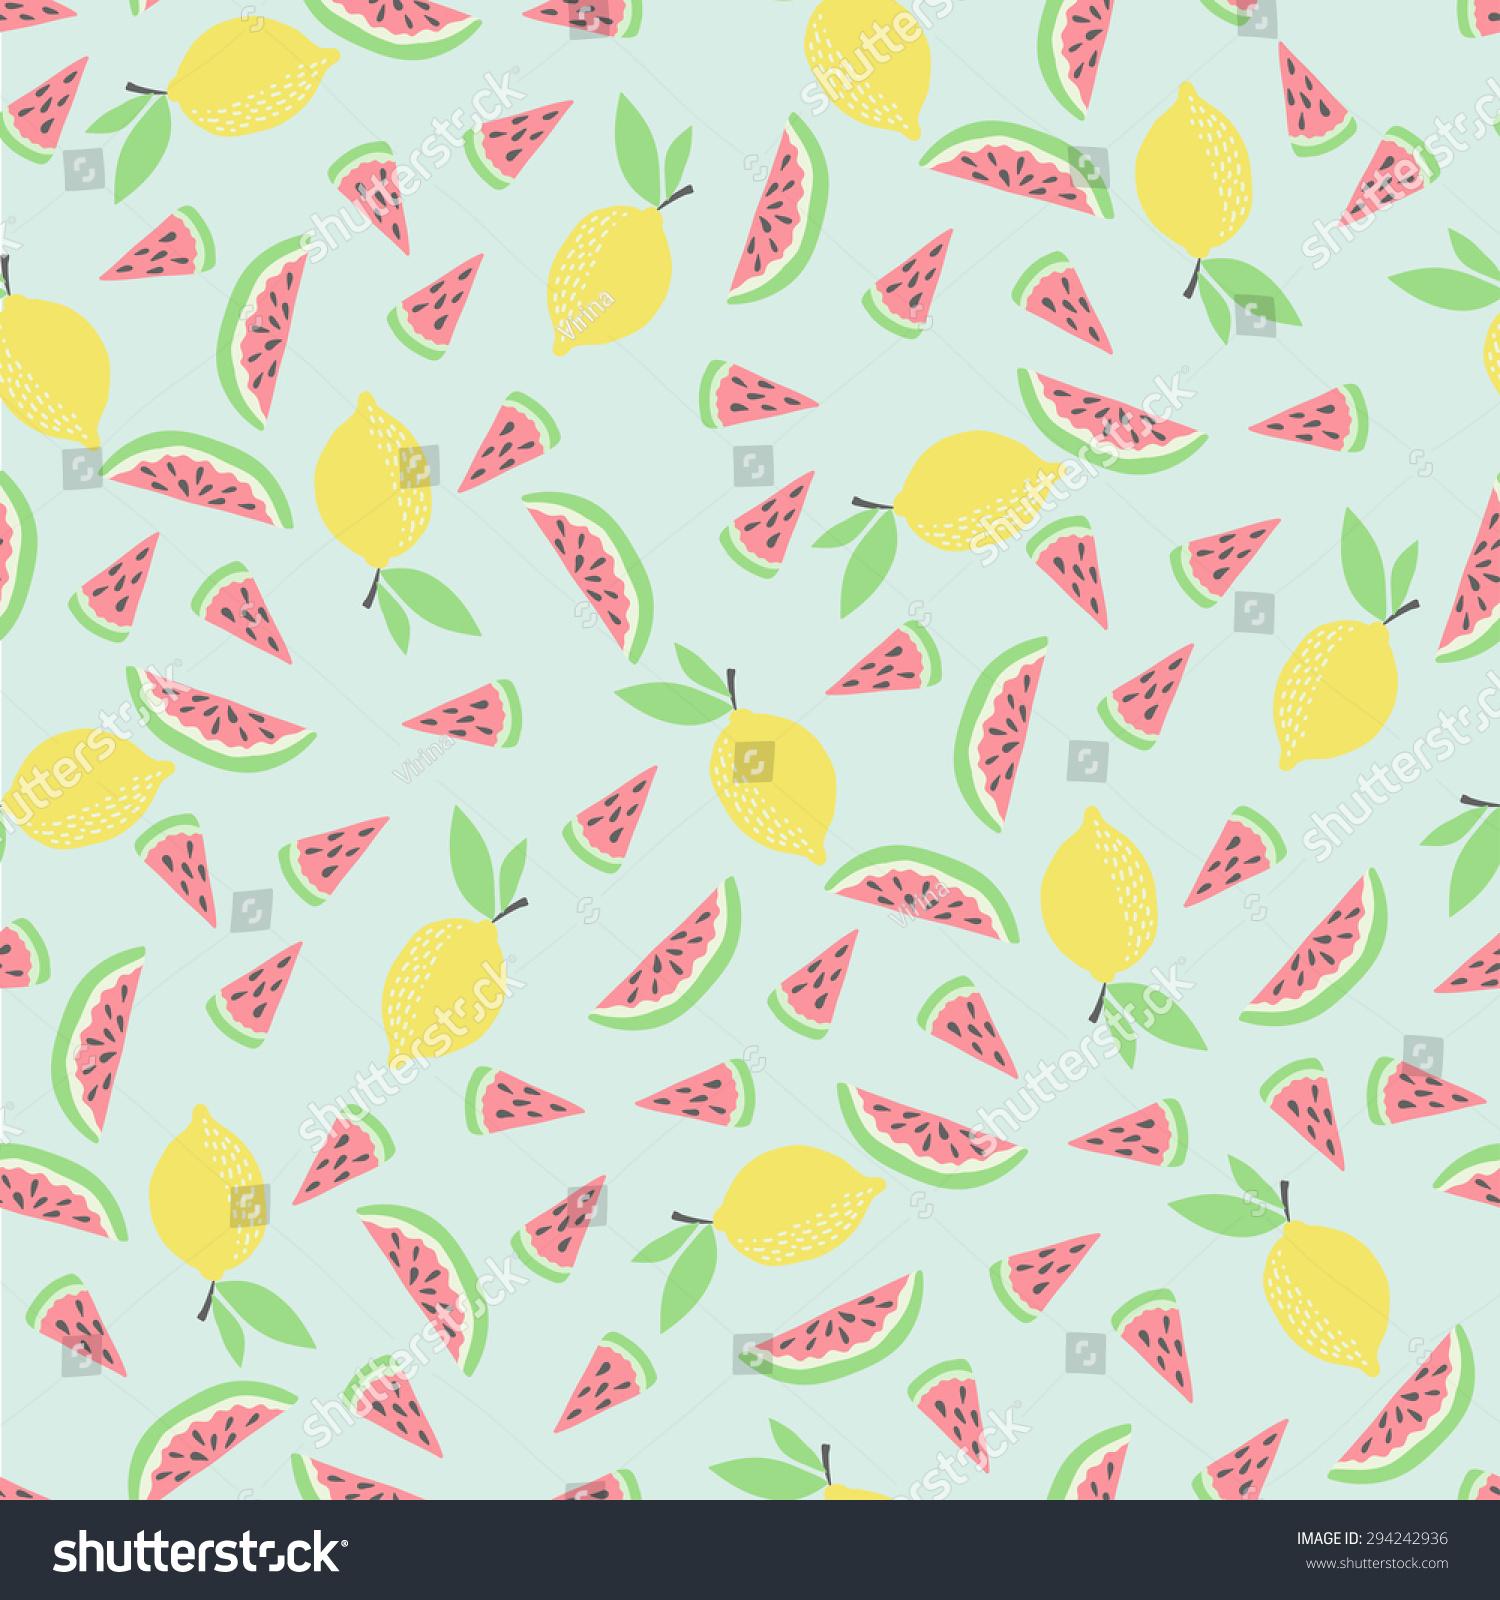 Fresh Ice Cream Stick In Summer Wallpaper Vector: Cute Funny Seamless Pattern Summer Fruit Stock Vector